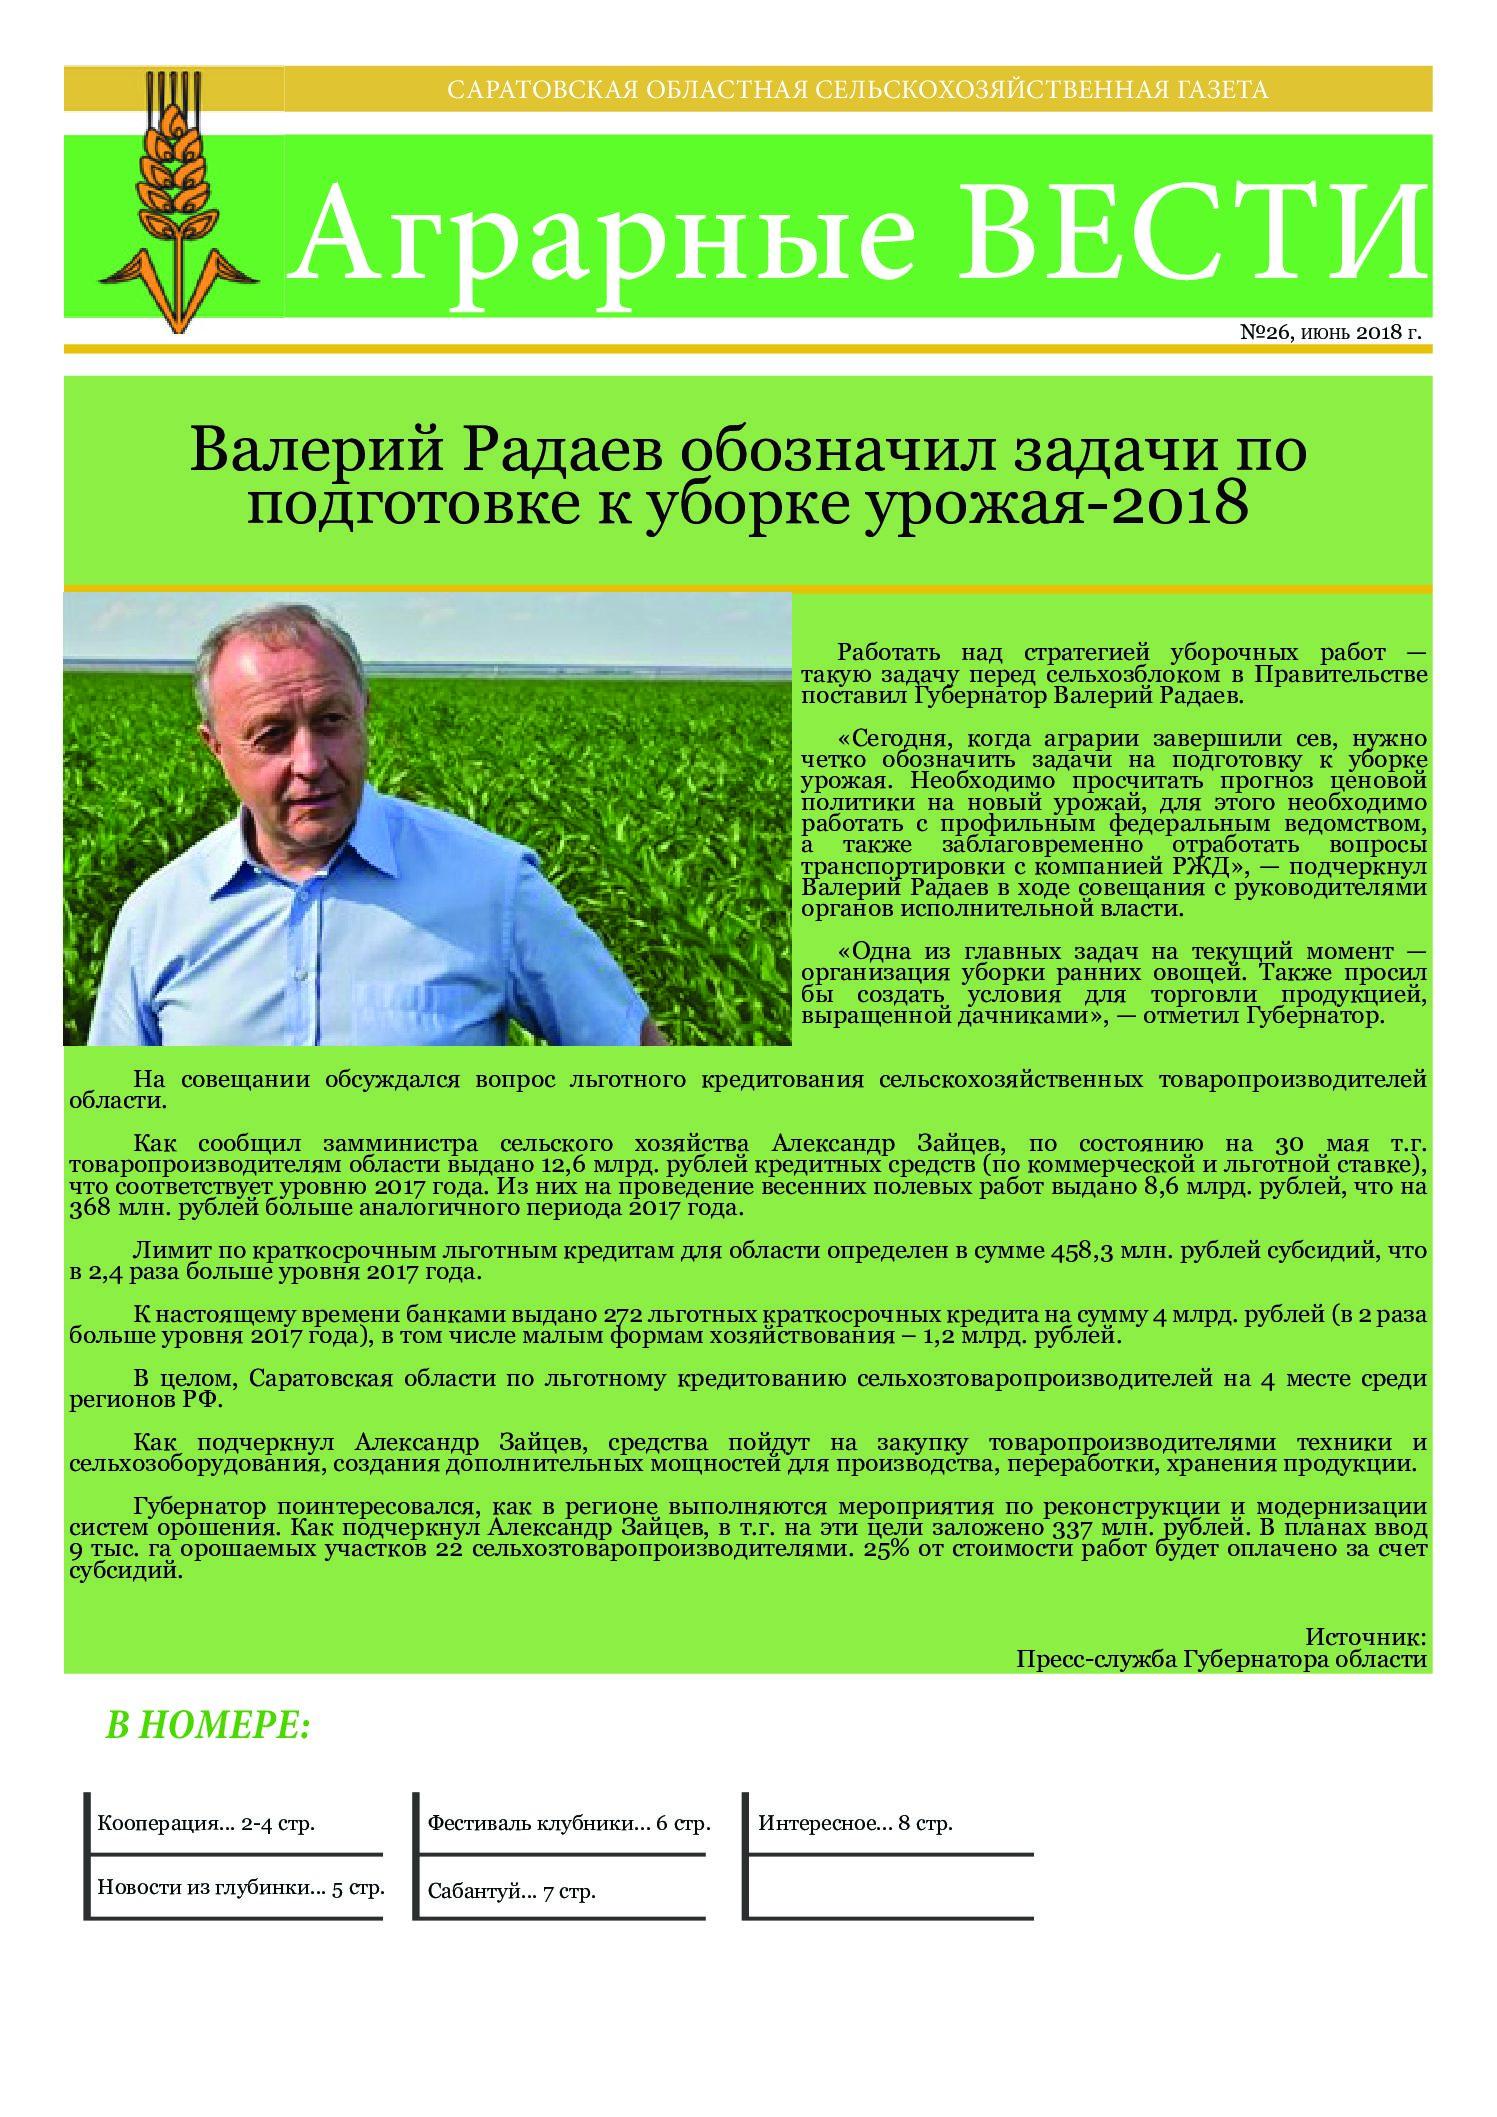 https://saratovagro.ru/wp-content/uploads/2020/08/5.2018-pdf.jpg